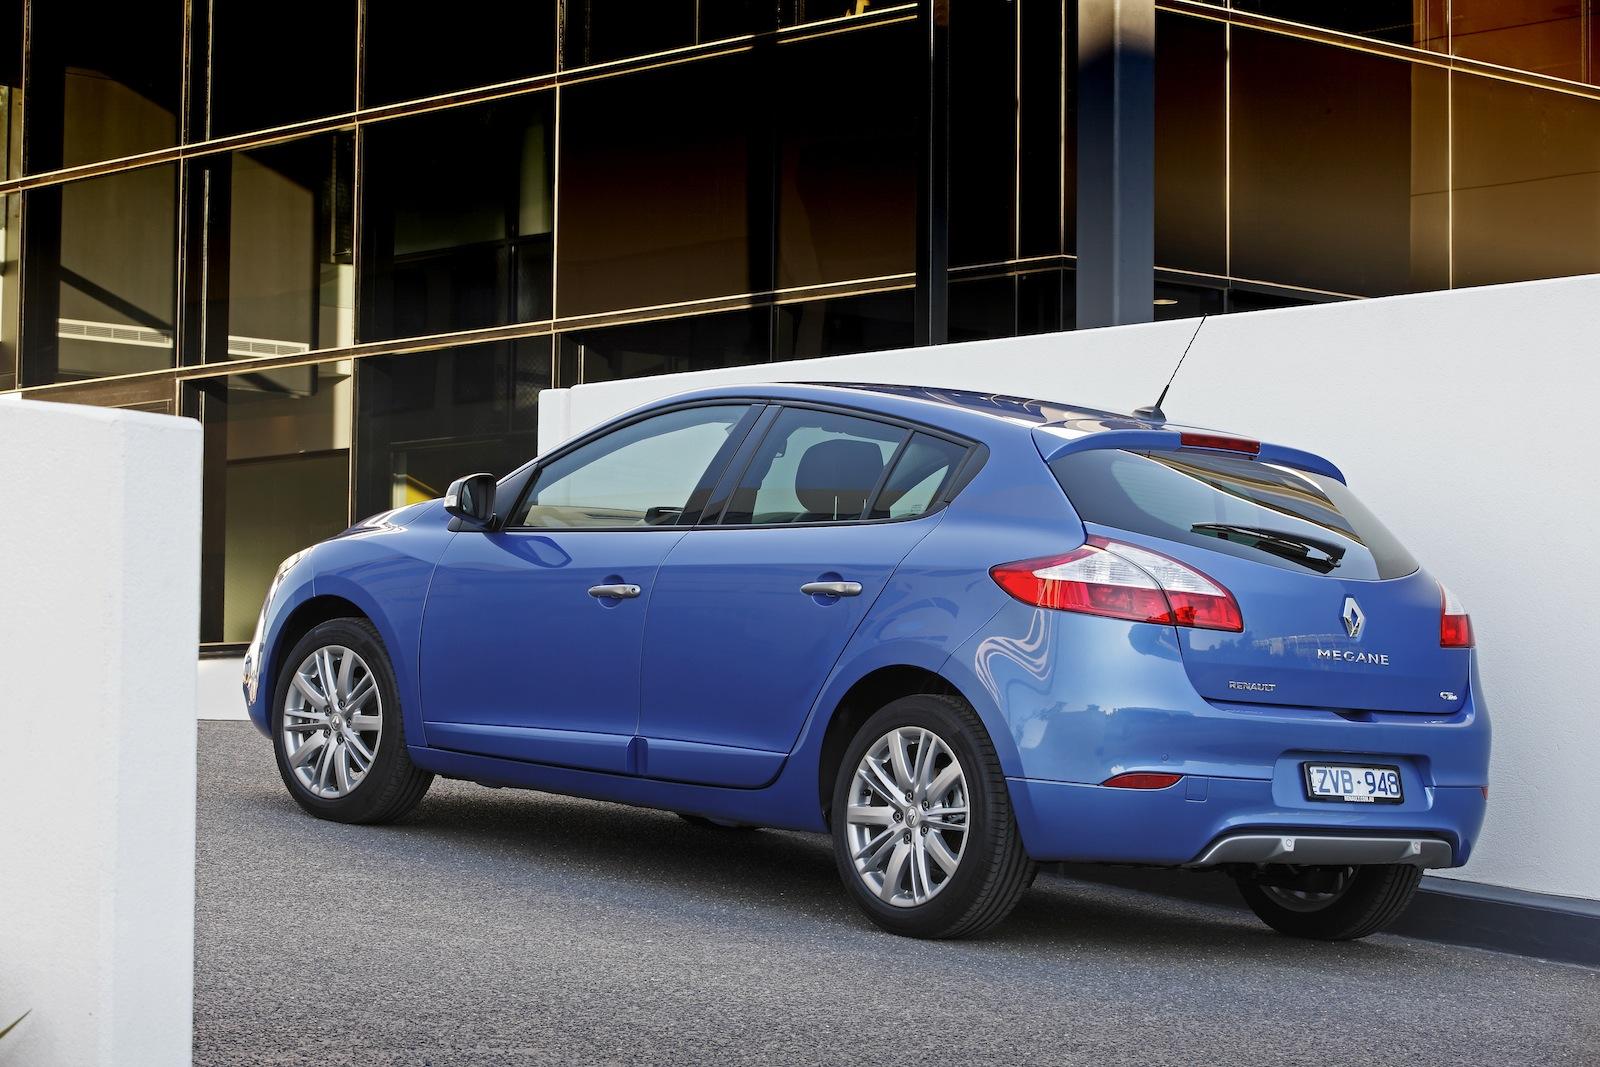 2013 Renault Megane Review Photos Caradvice